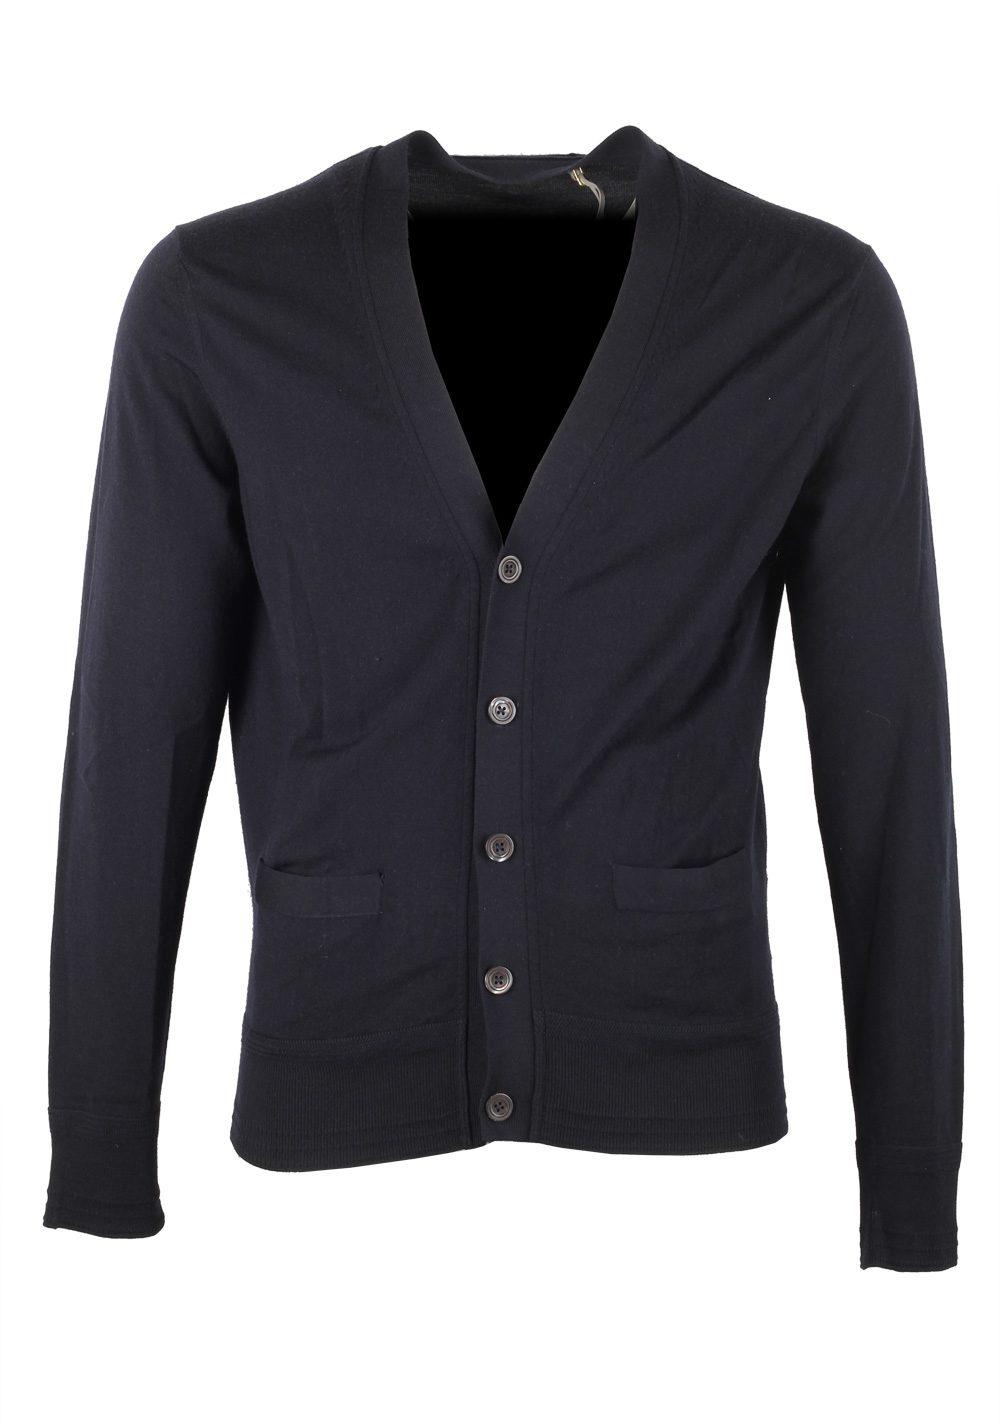 TOM FORD Blue Cardigan Size 48 / 38R U.S. in Wool | Costume Limité